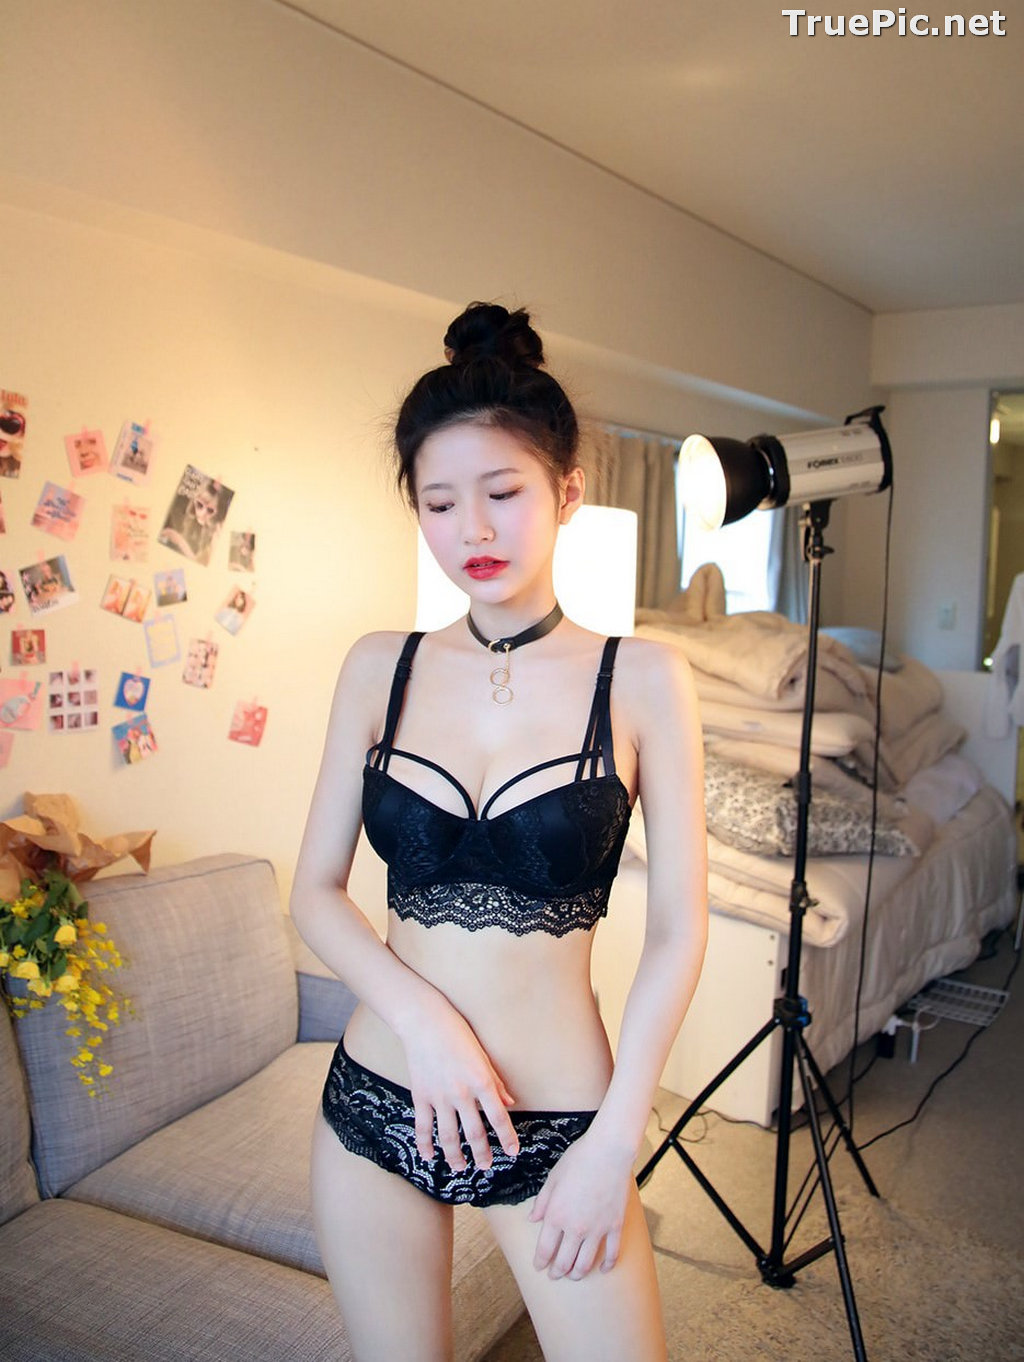 Image Korean Fashion Model - Asaki - Black and White Lingerie Set - TruePic.net - Picture-5